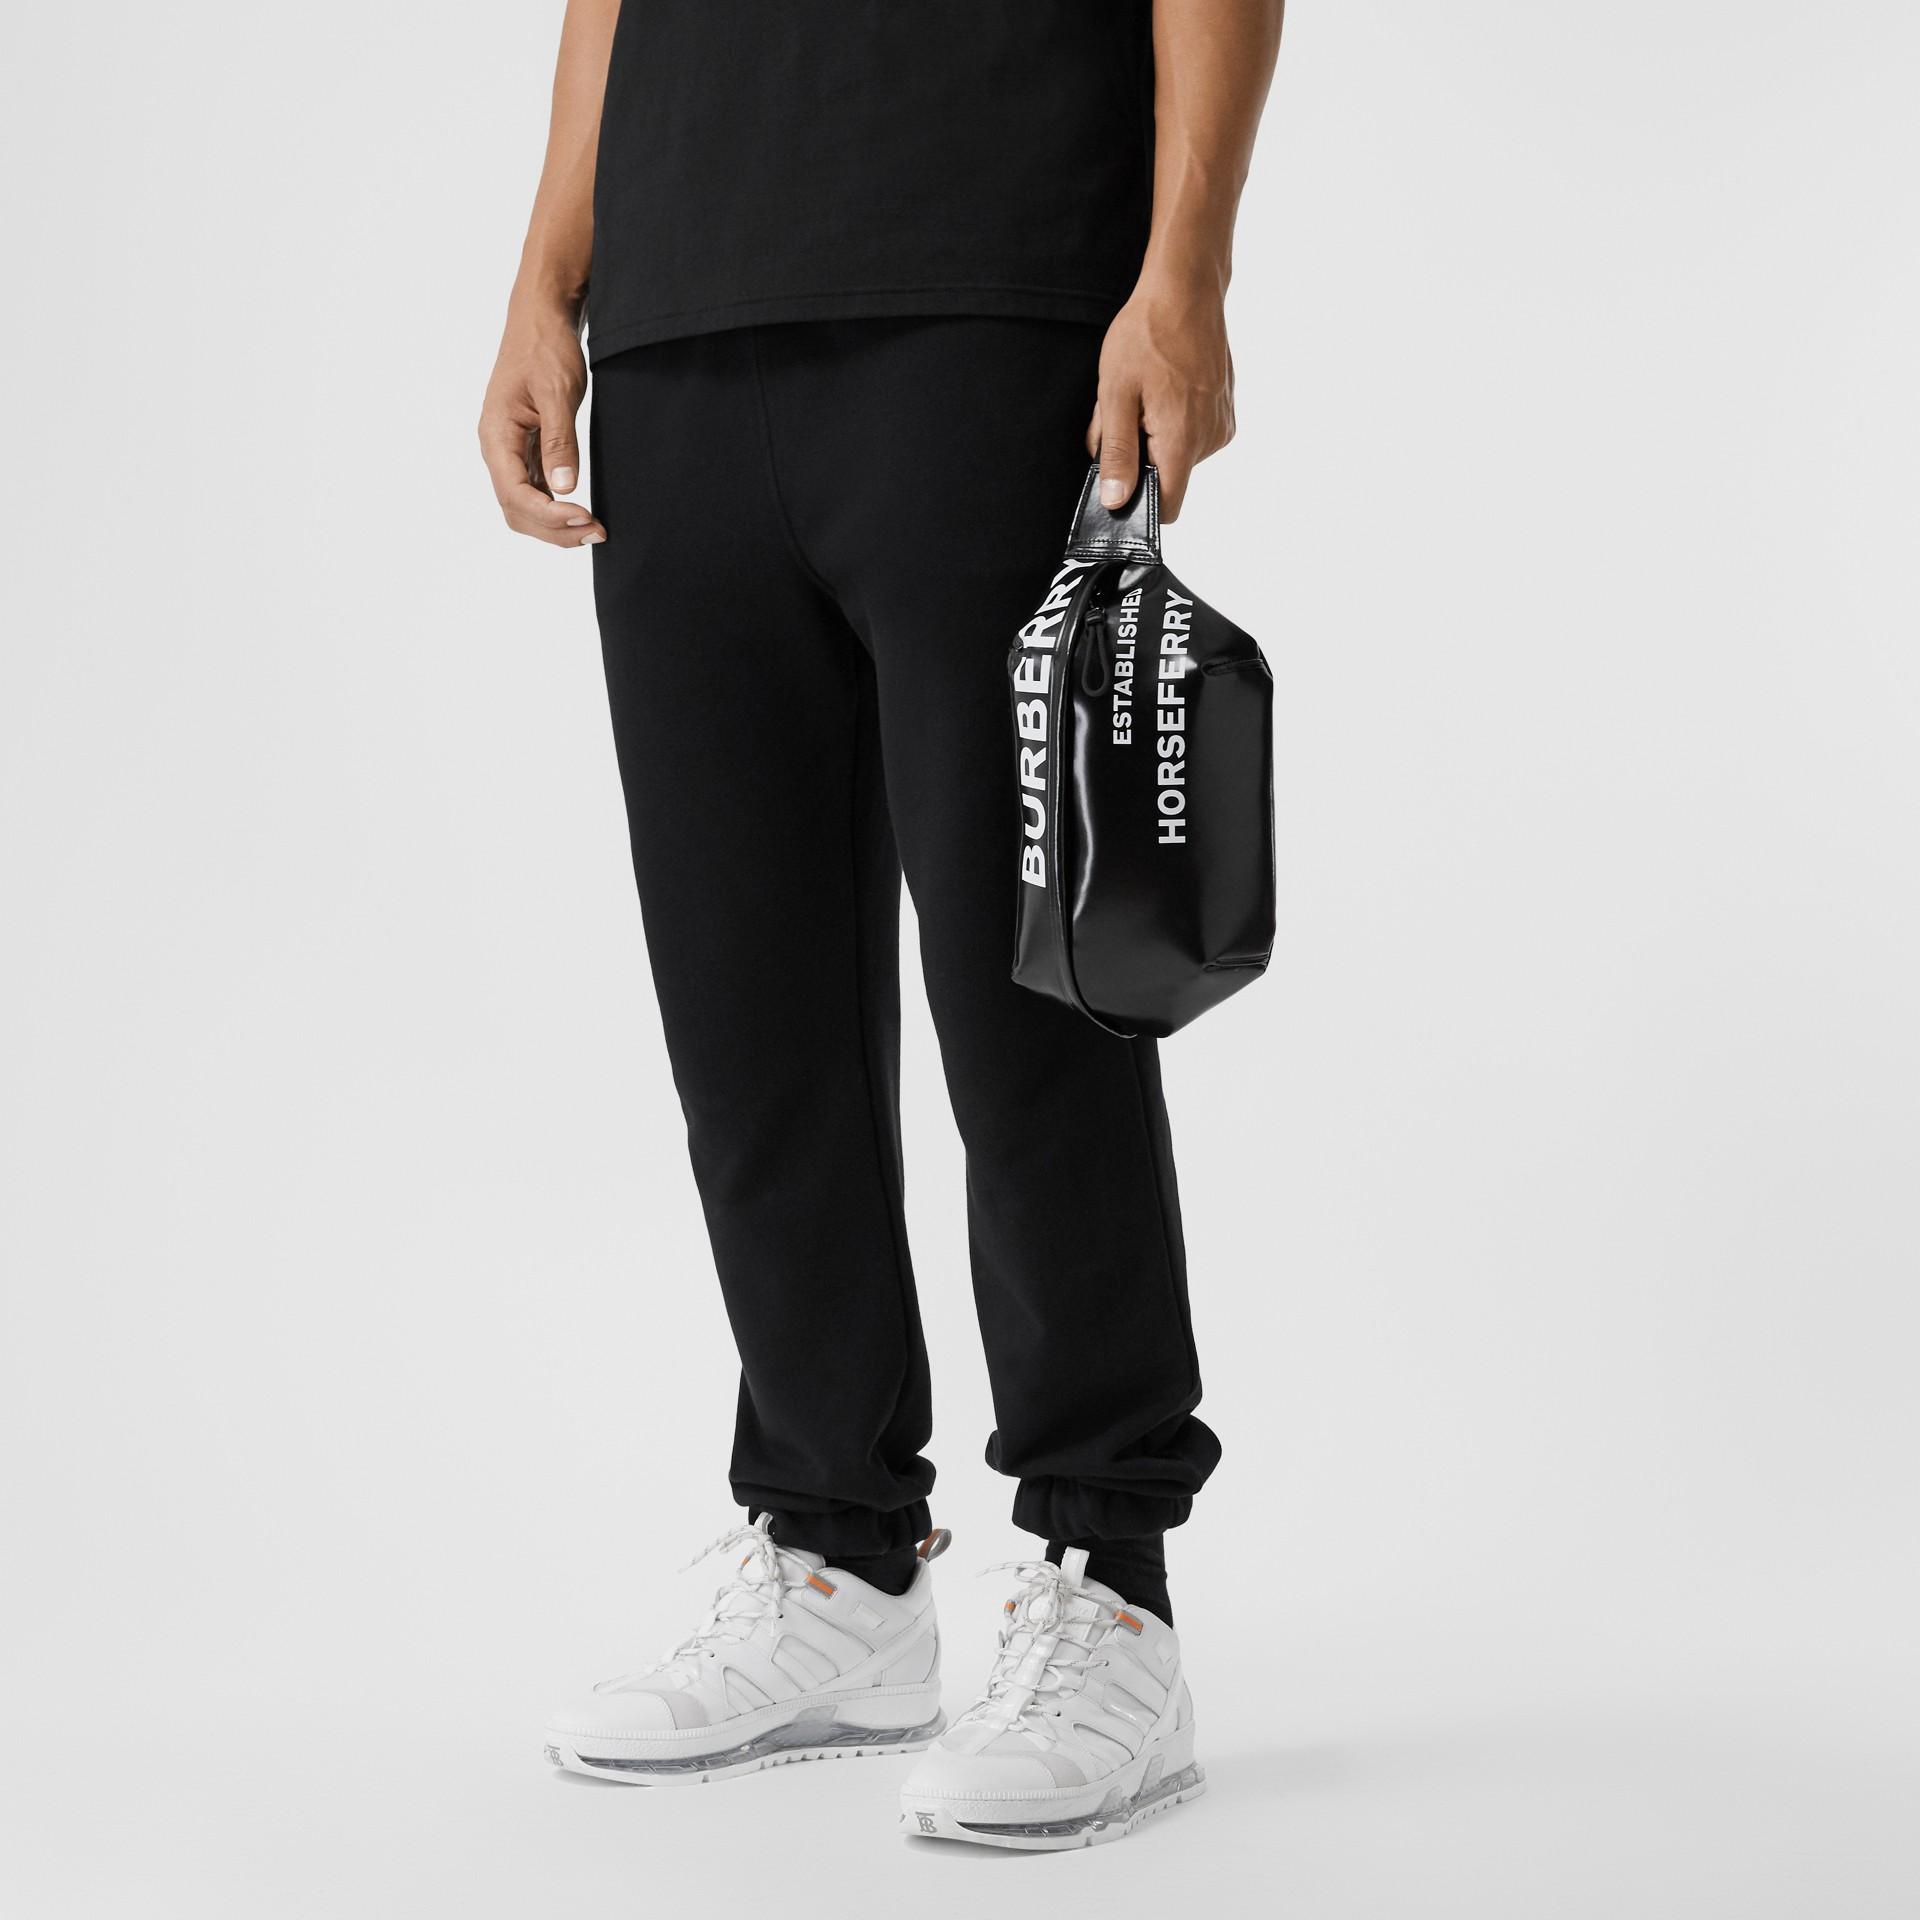 Medium Horseferry Print Bum Bag in Black | Burberry United Kingdom - gallery image 3